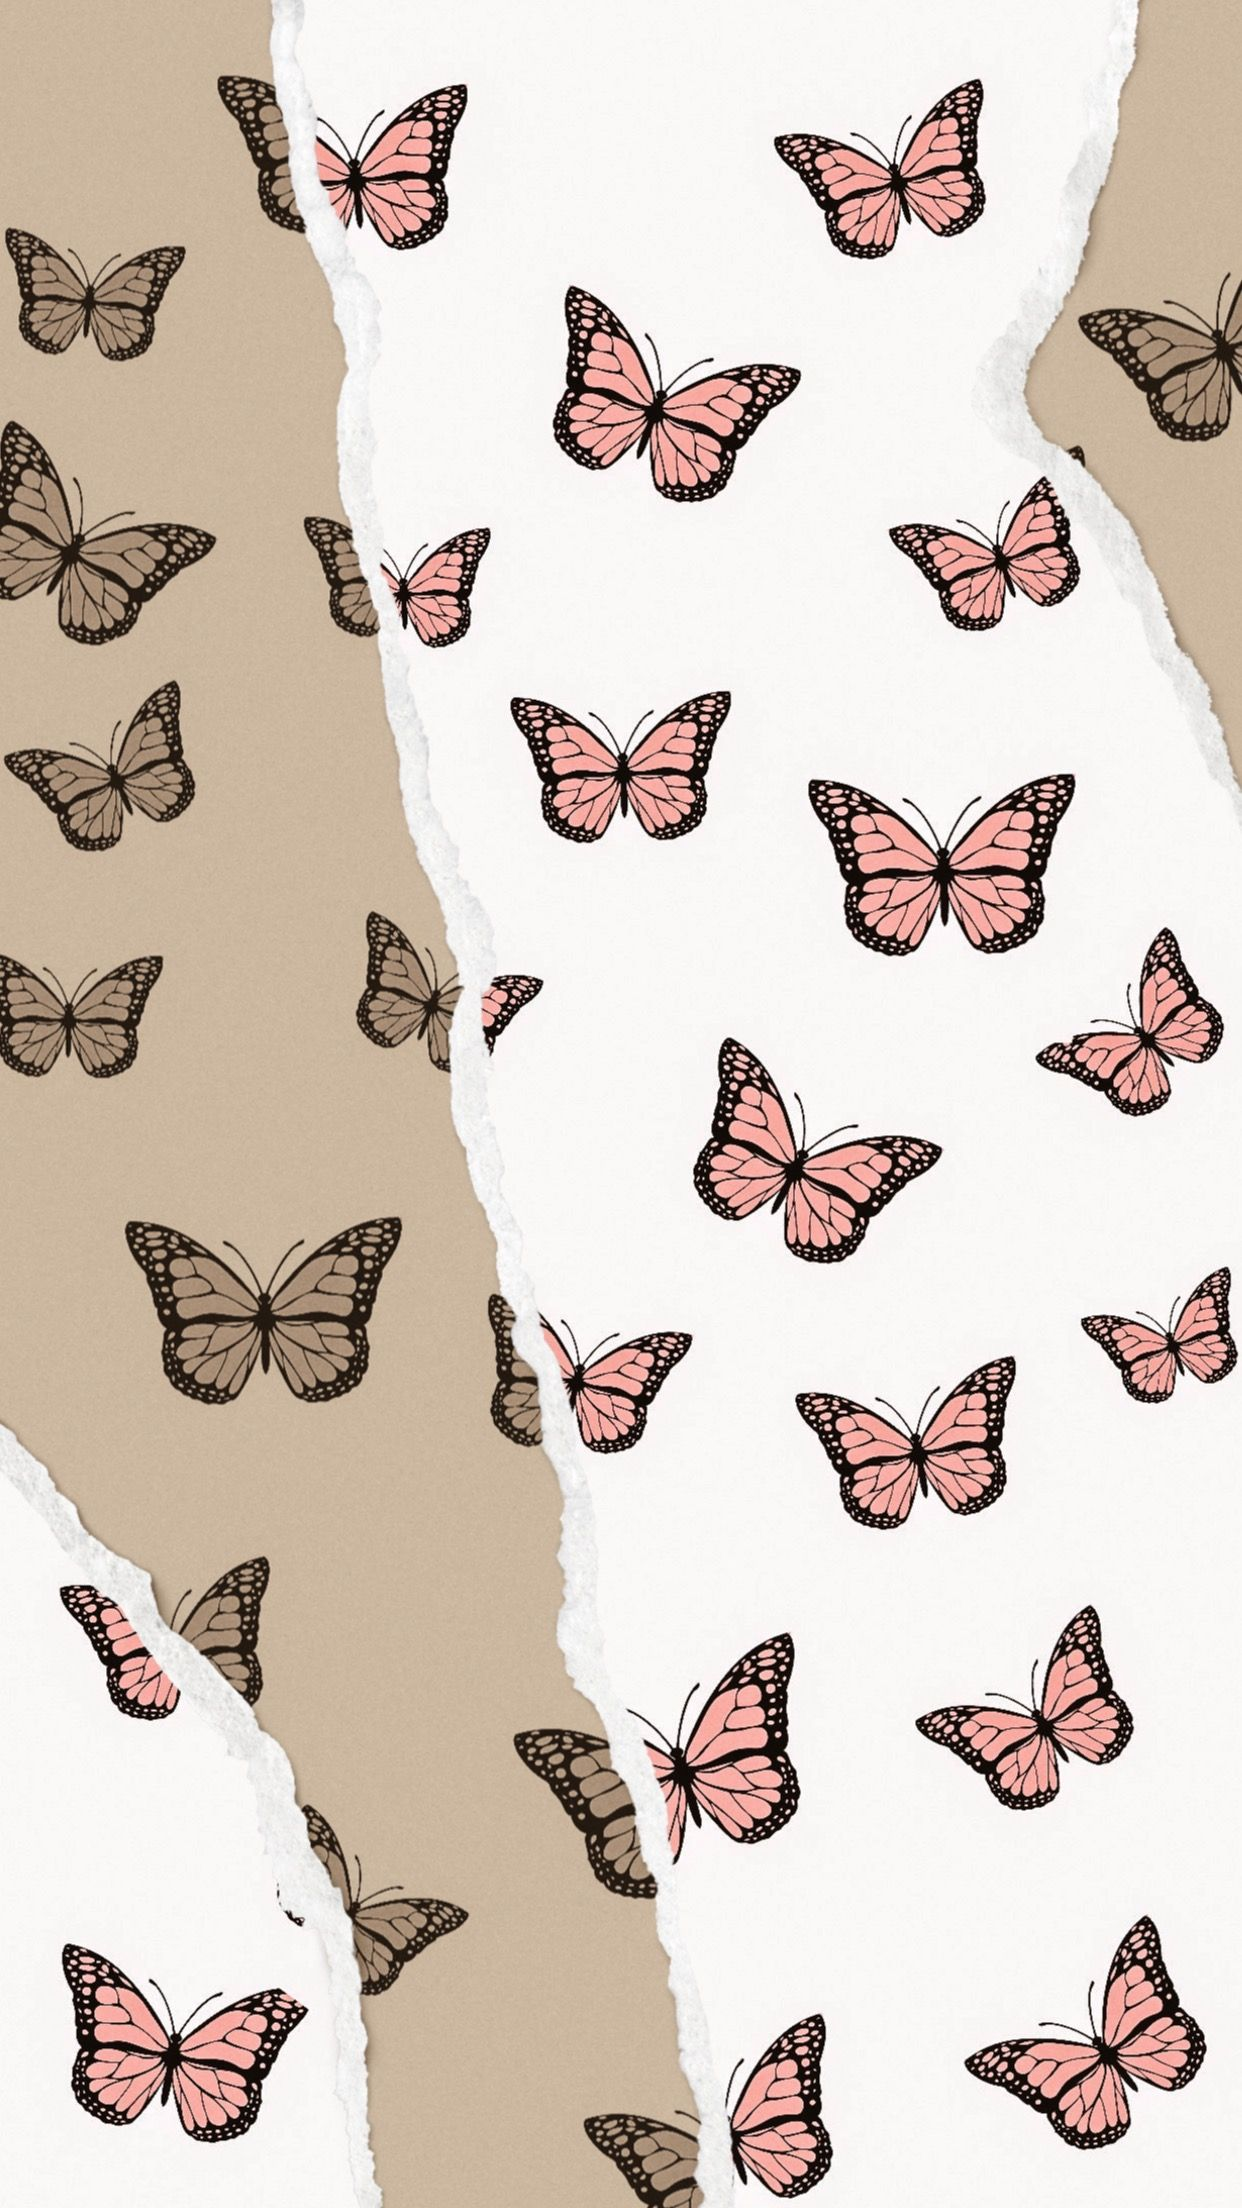 Pink Butterflies In 2020 Butterfly Wallpaper Iphone Cute Patterns Wallpaper Aesthetic Iphone Wallpaper